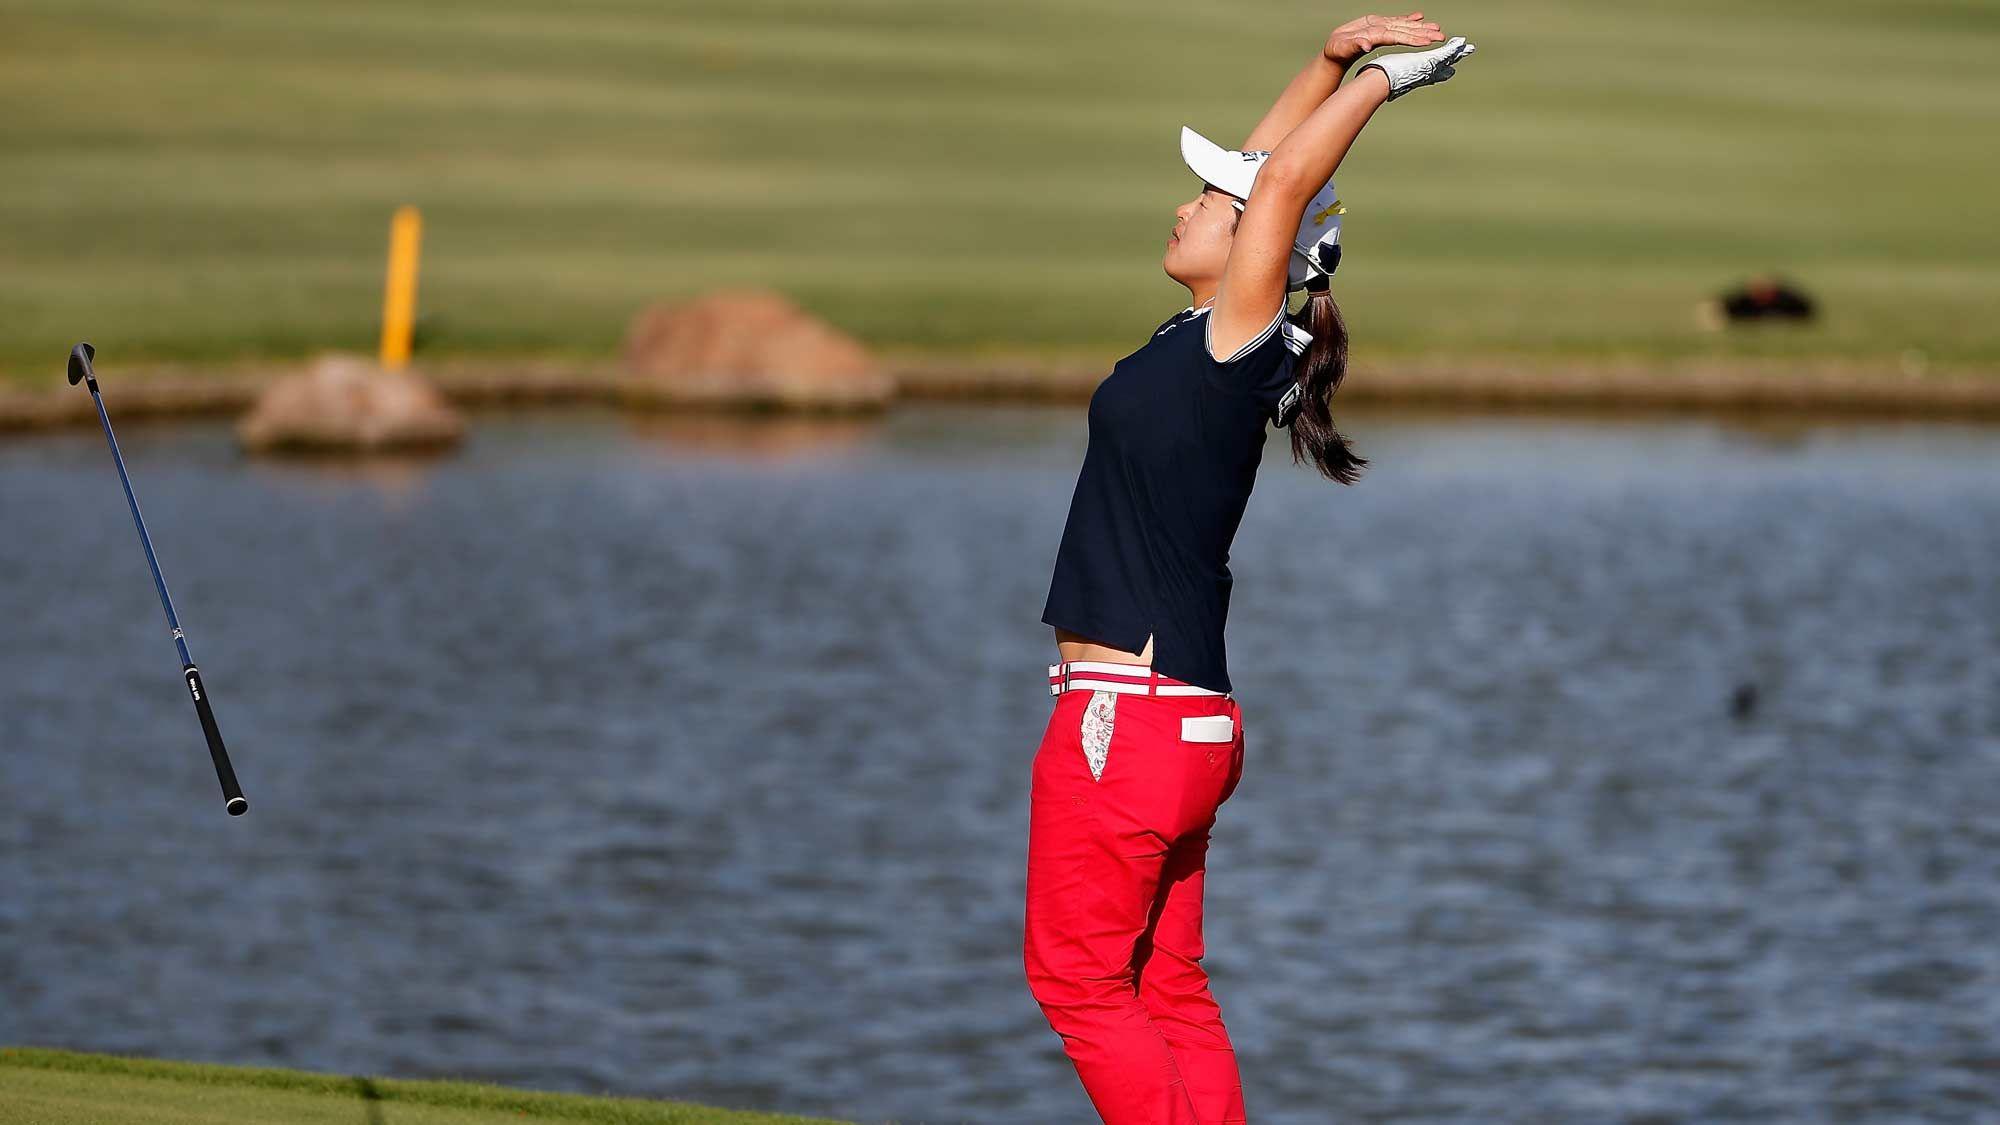 Eagles for a cause lpga ladies professional golf